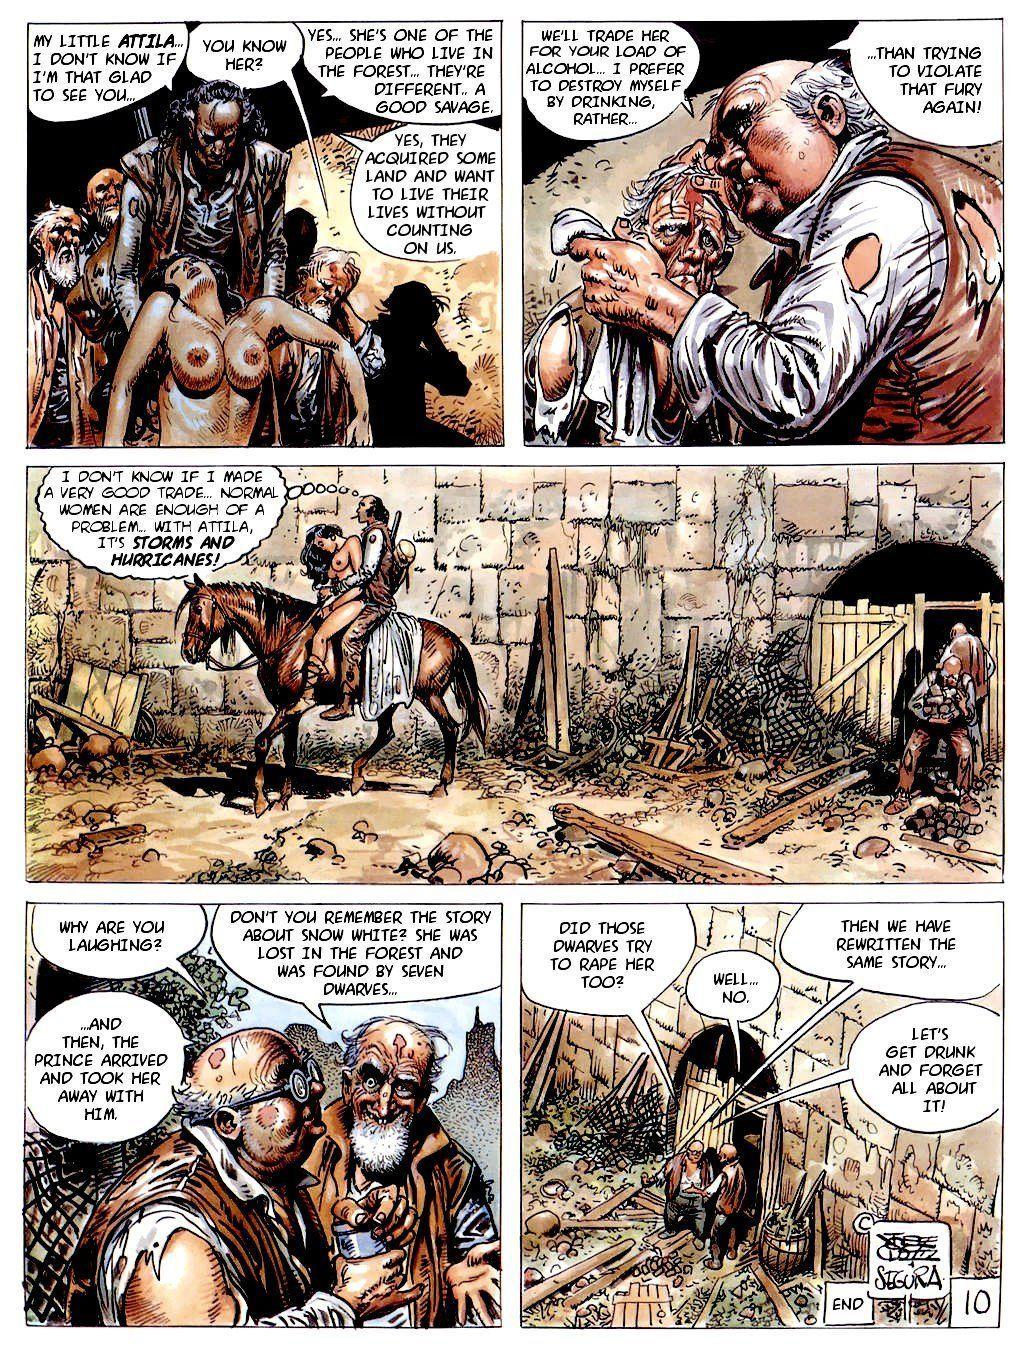 Attila comics segura hentai